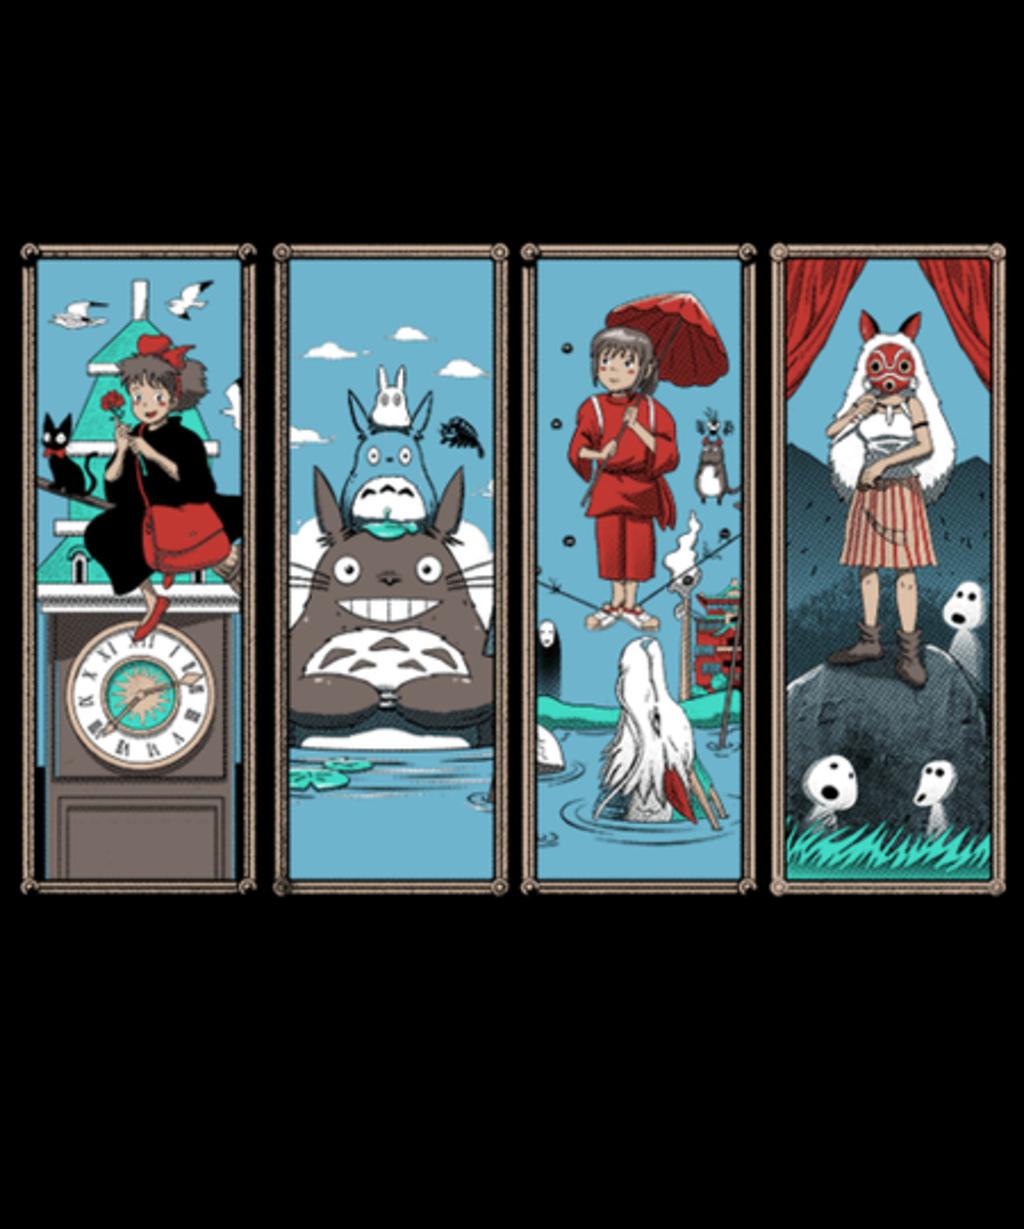 Qwertee: Haunted Ghibli Mansion